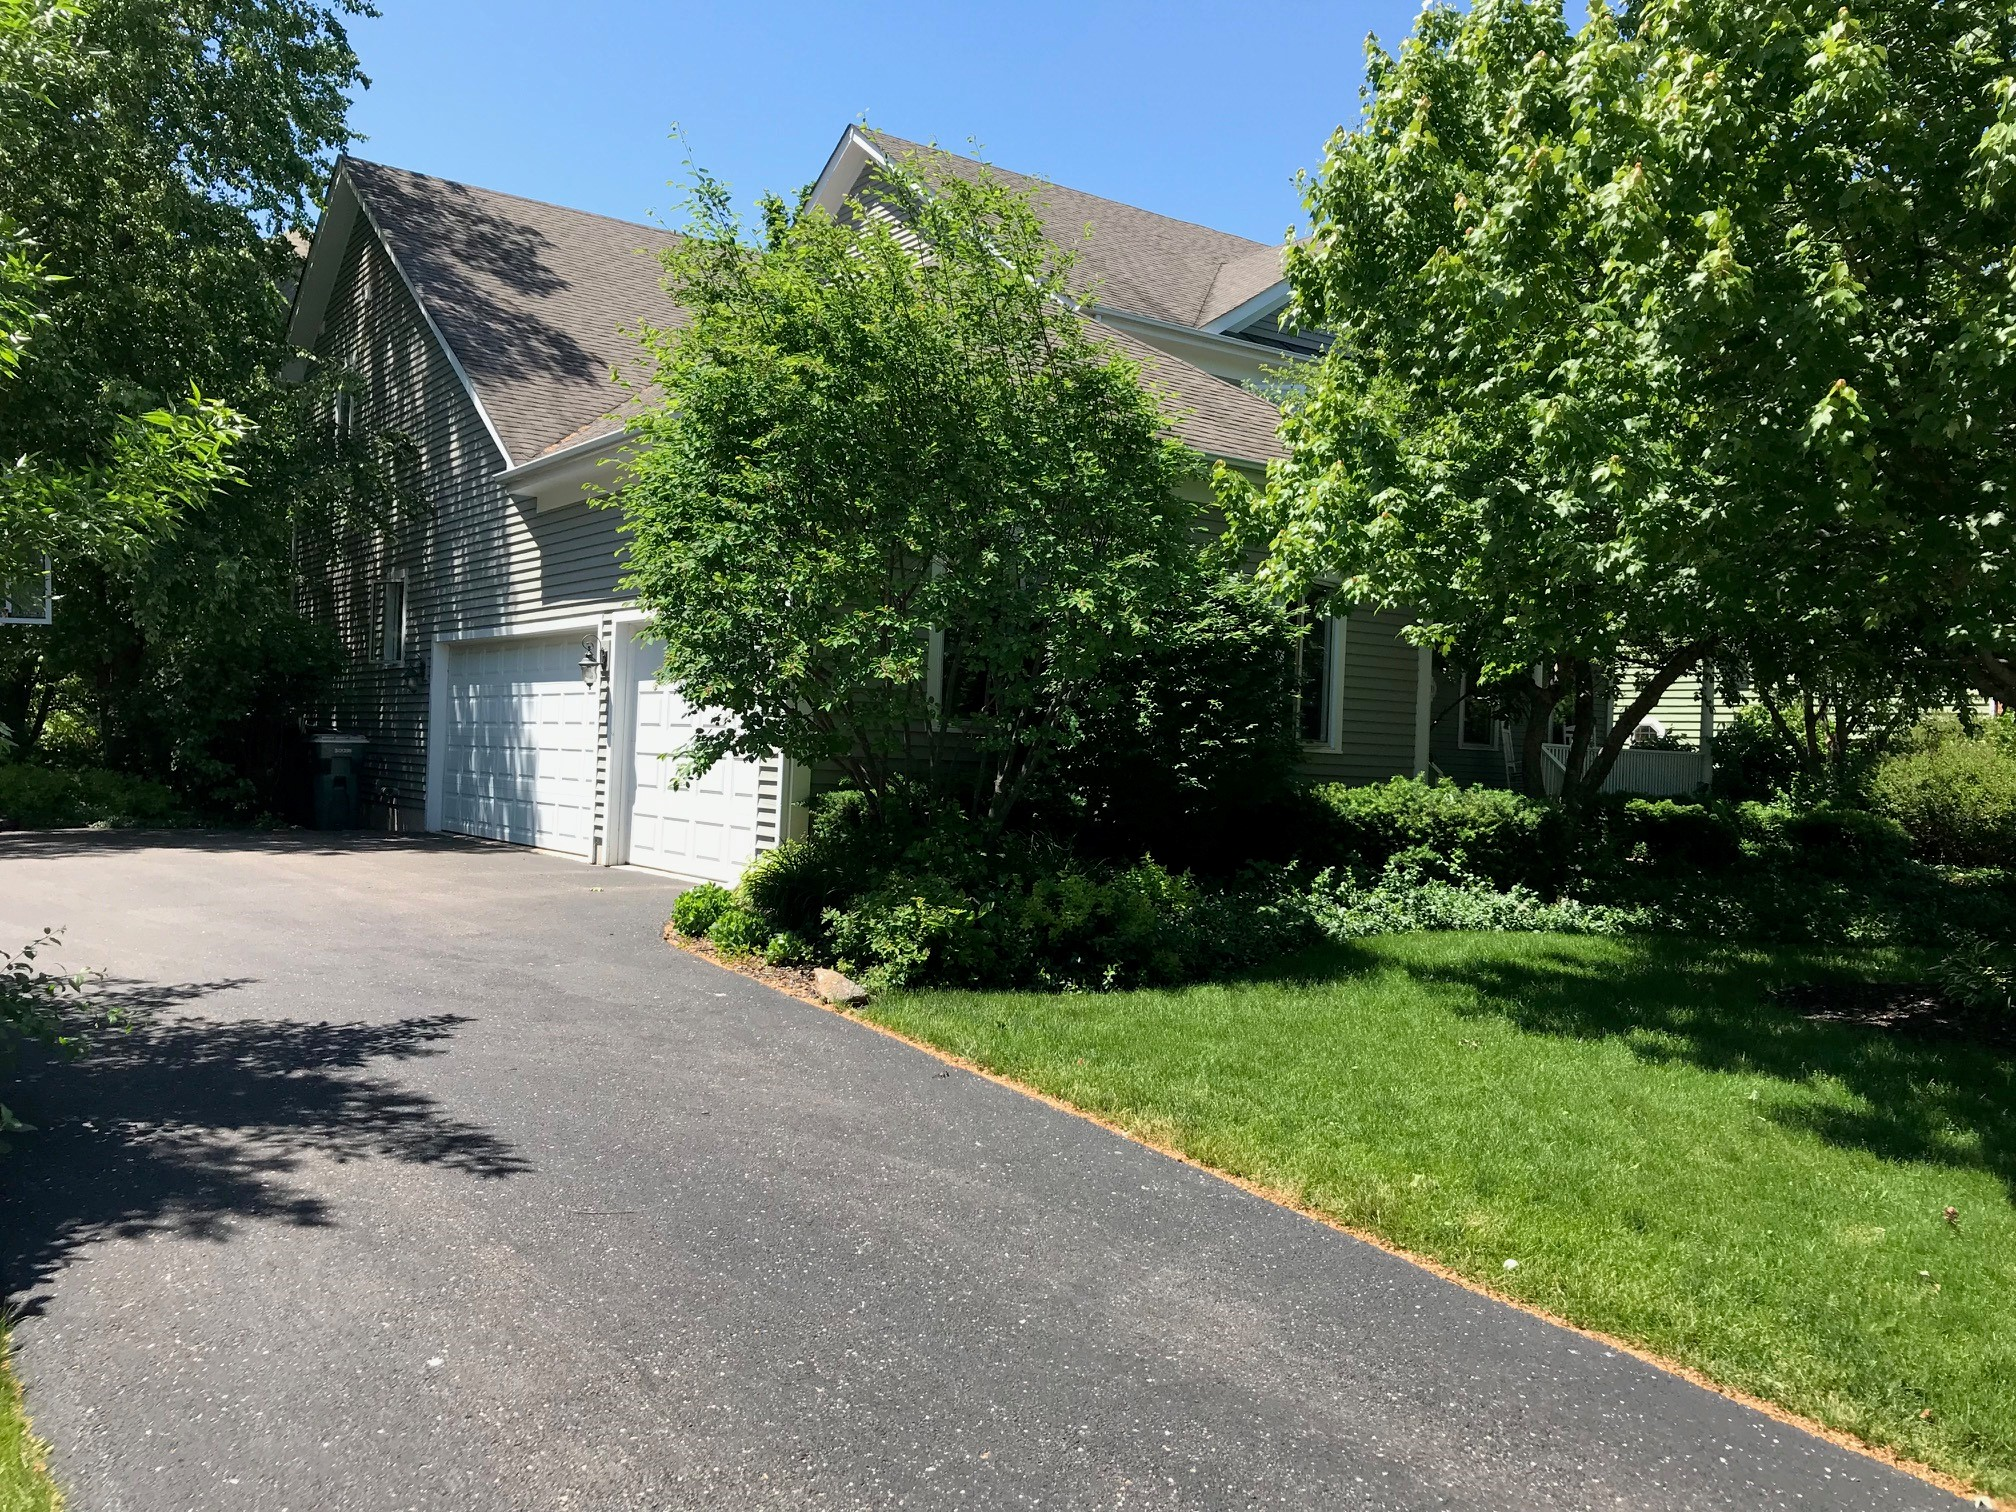 Photo of 70 Westhaven Circle, Geneva, IL, 60134